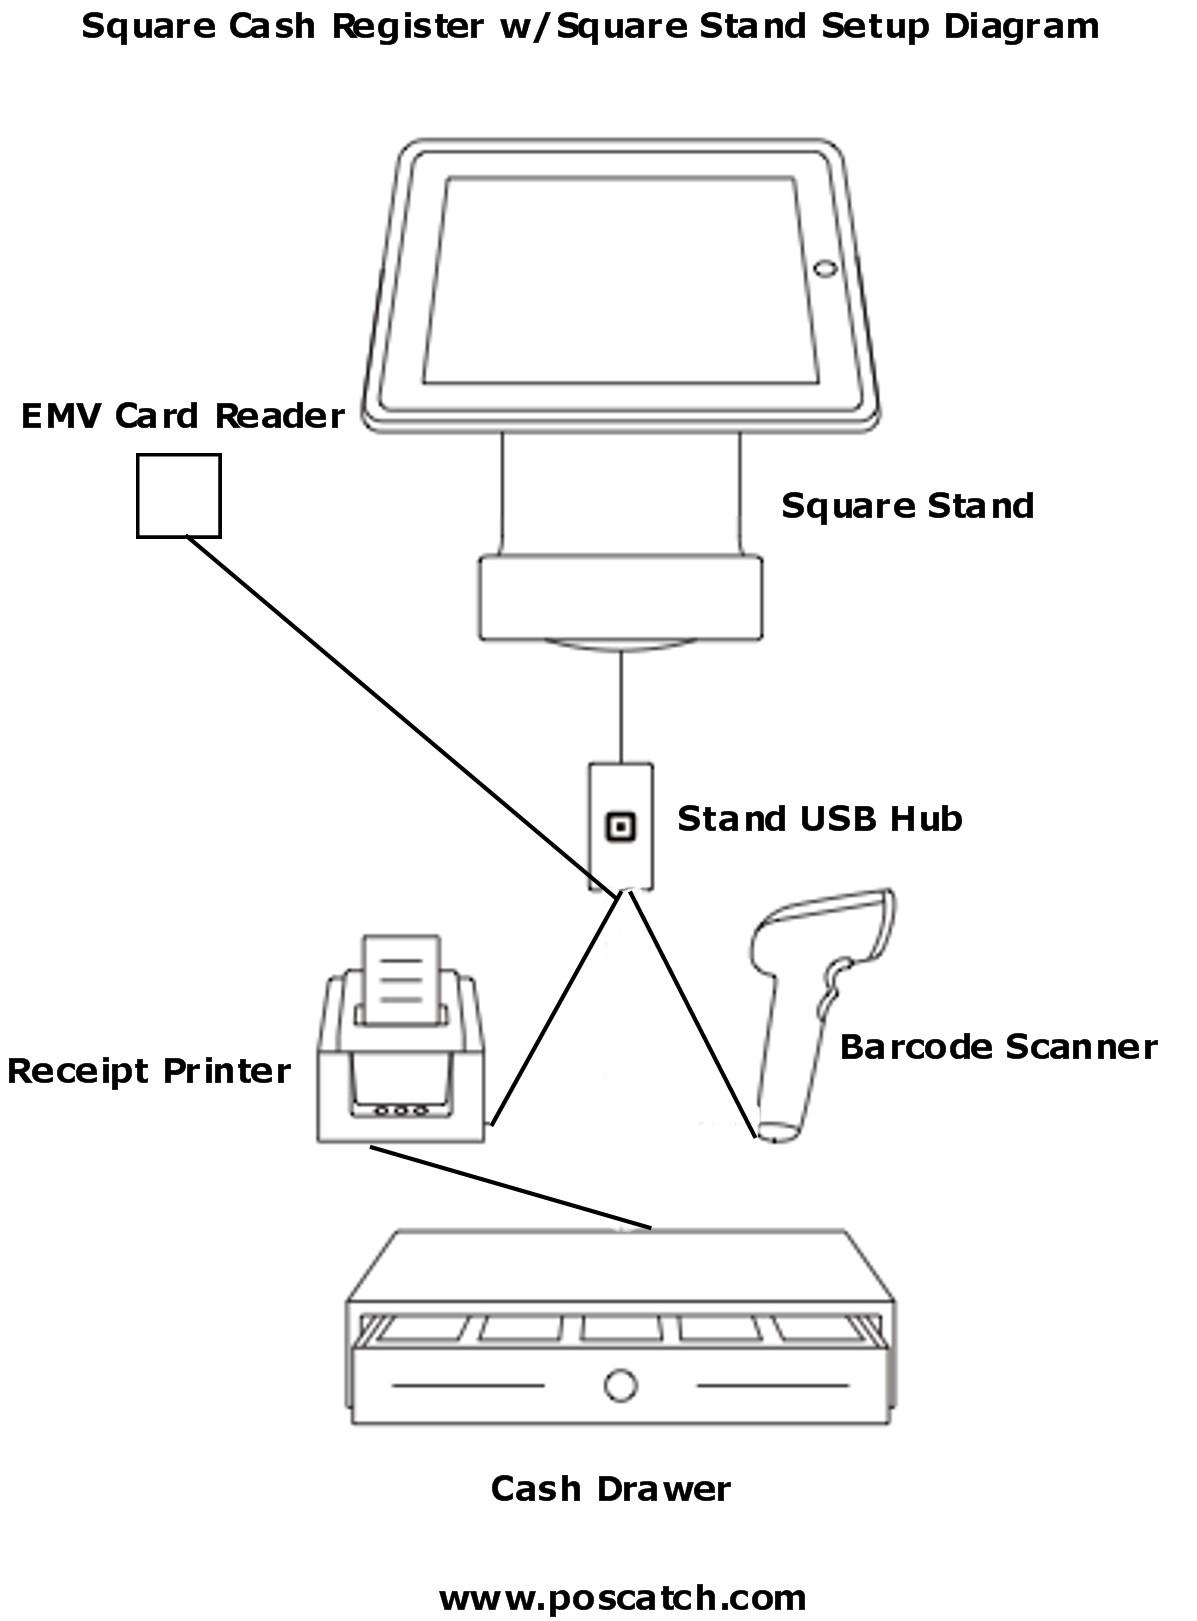 square-register-hardware-setup.2.jpg